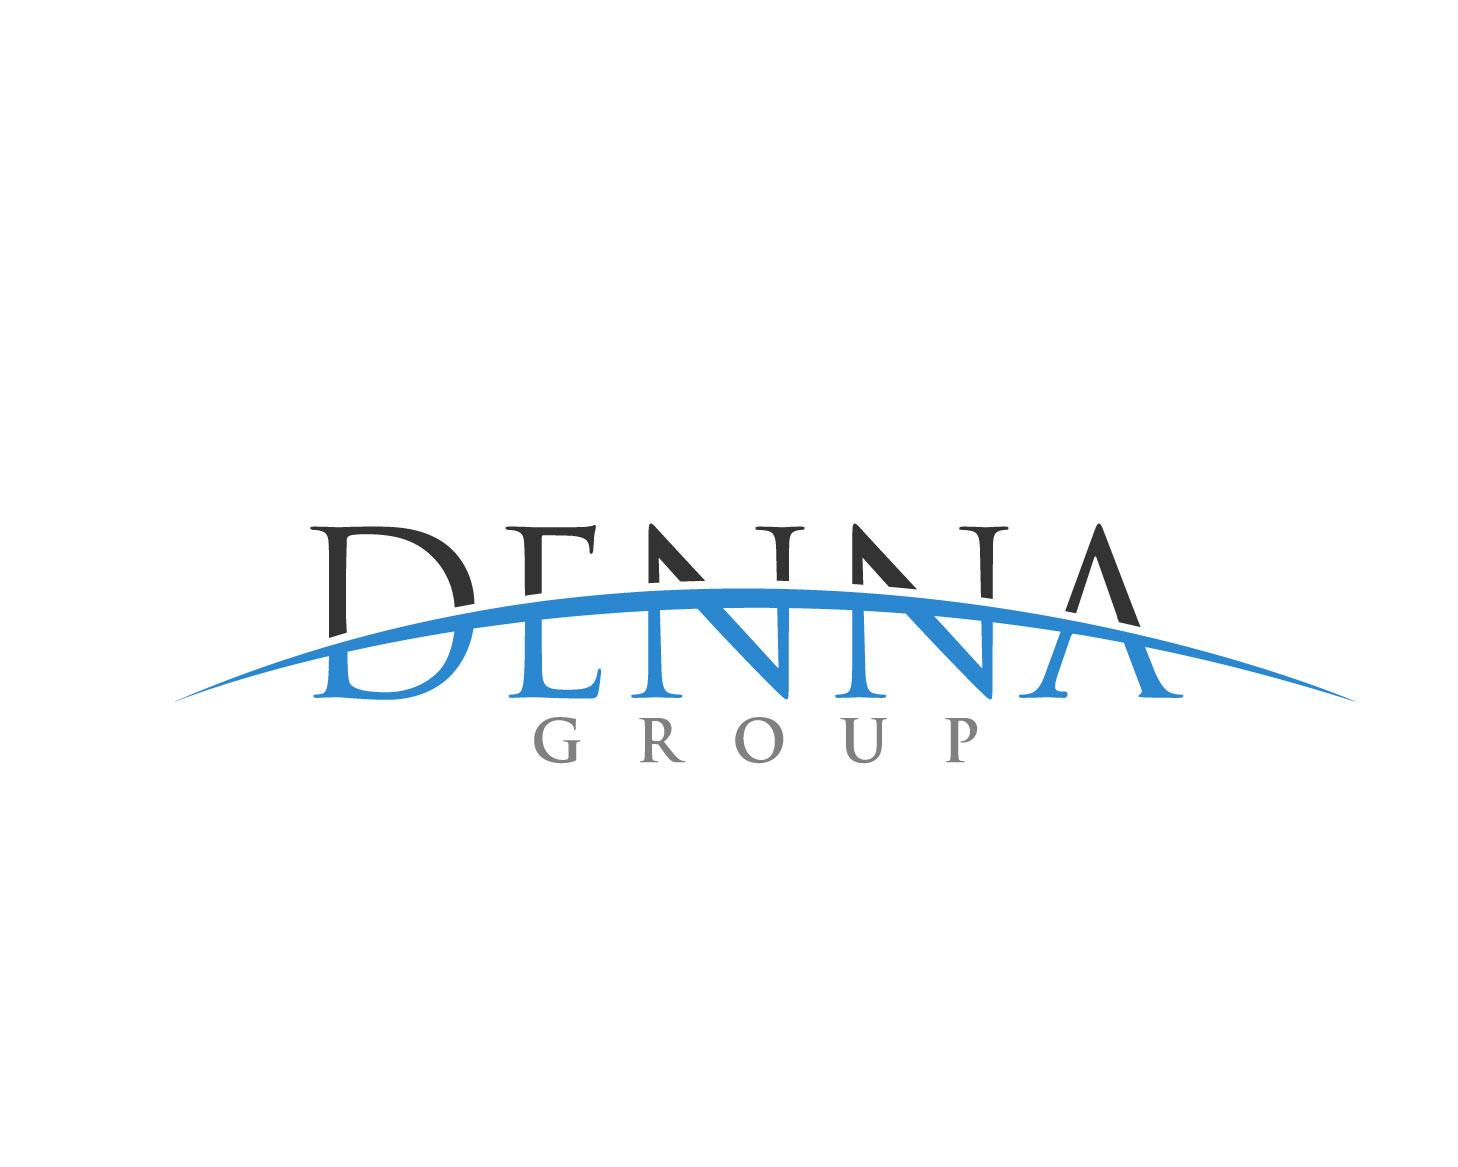 Logo Design by Private User - Entry No. 168 in the Logo Design Contest Denna Group Logo Design.